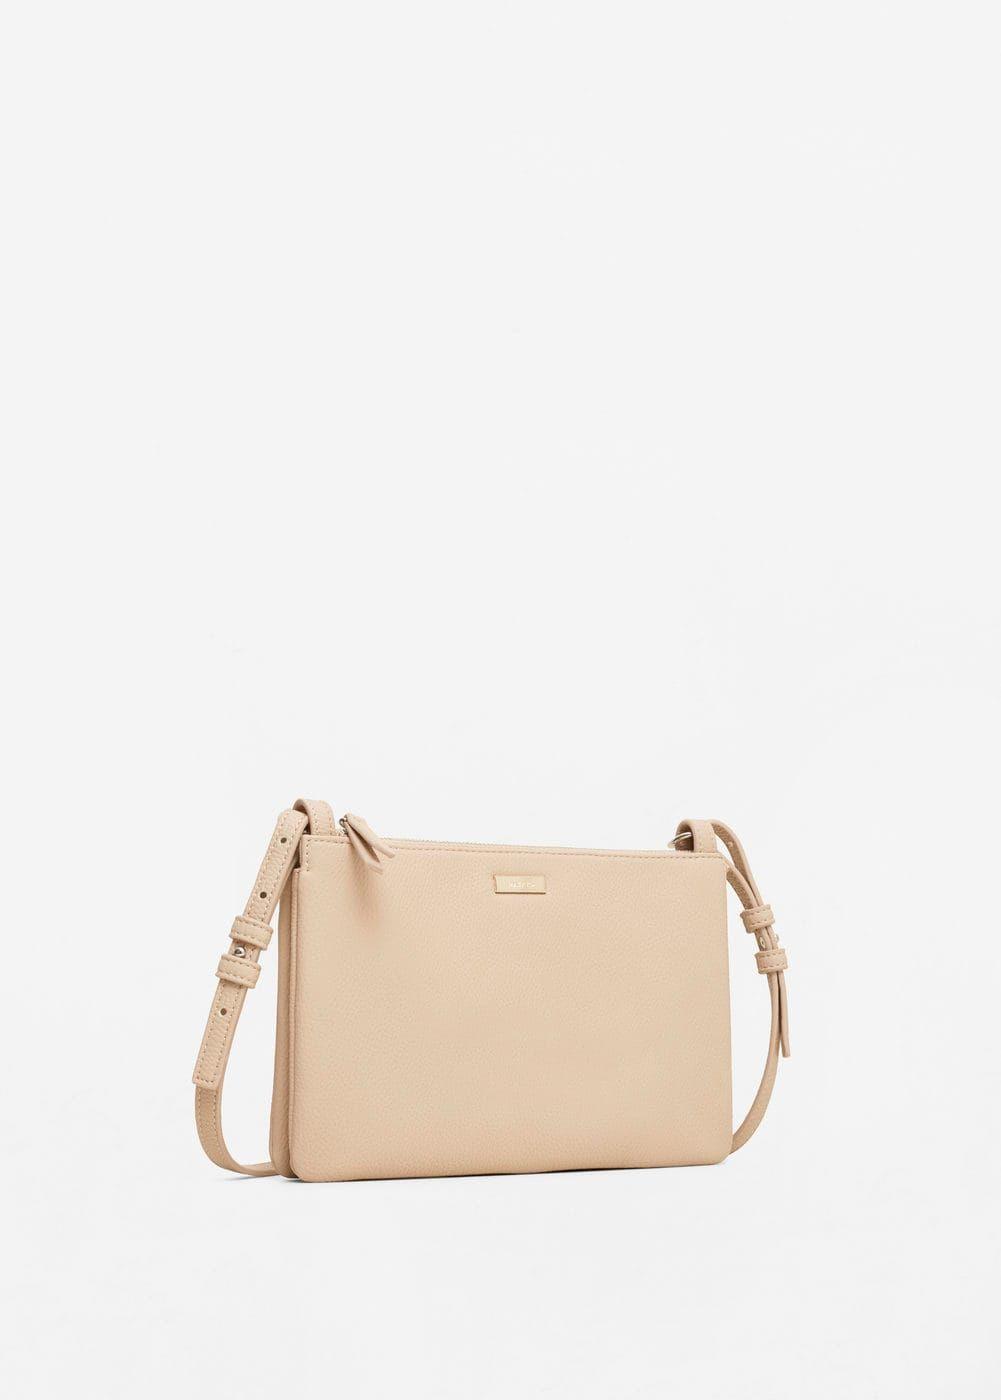 abeae5137 Zipped pebbled bag - Woman | Spring style | Bags, Crossbody bag ...